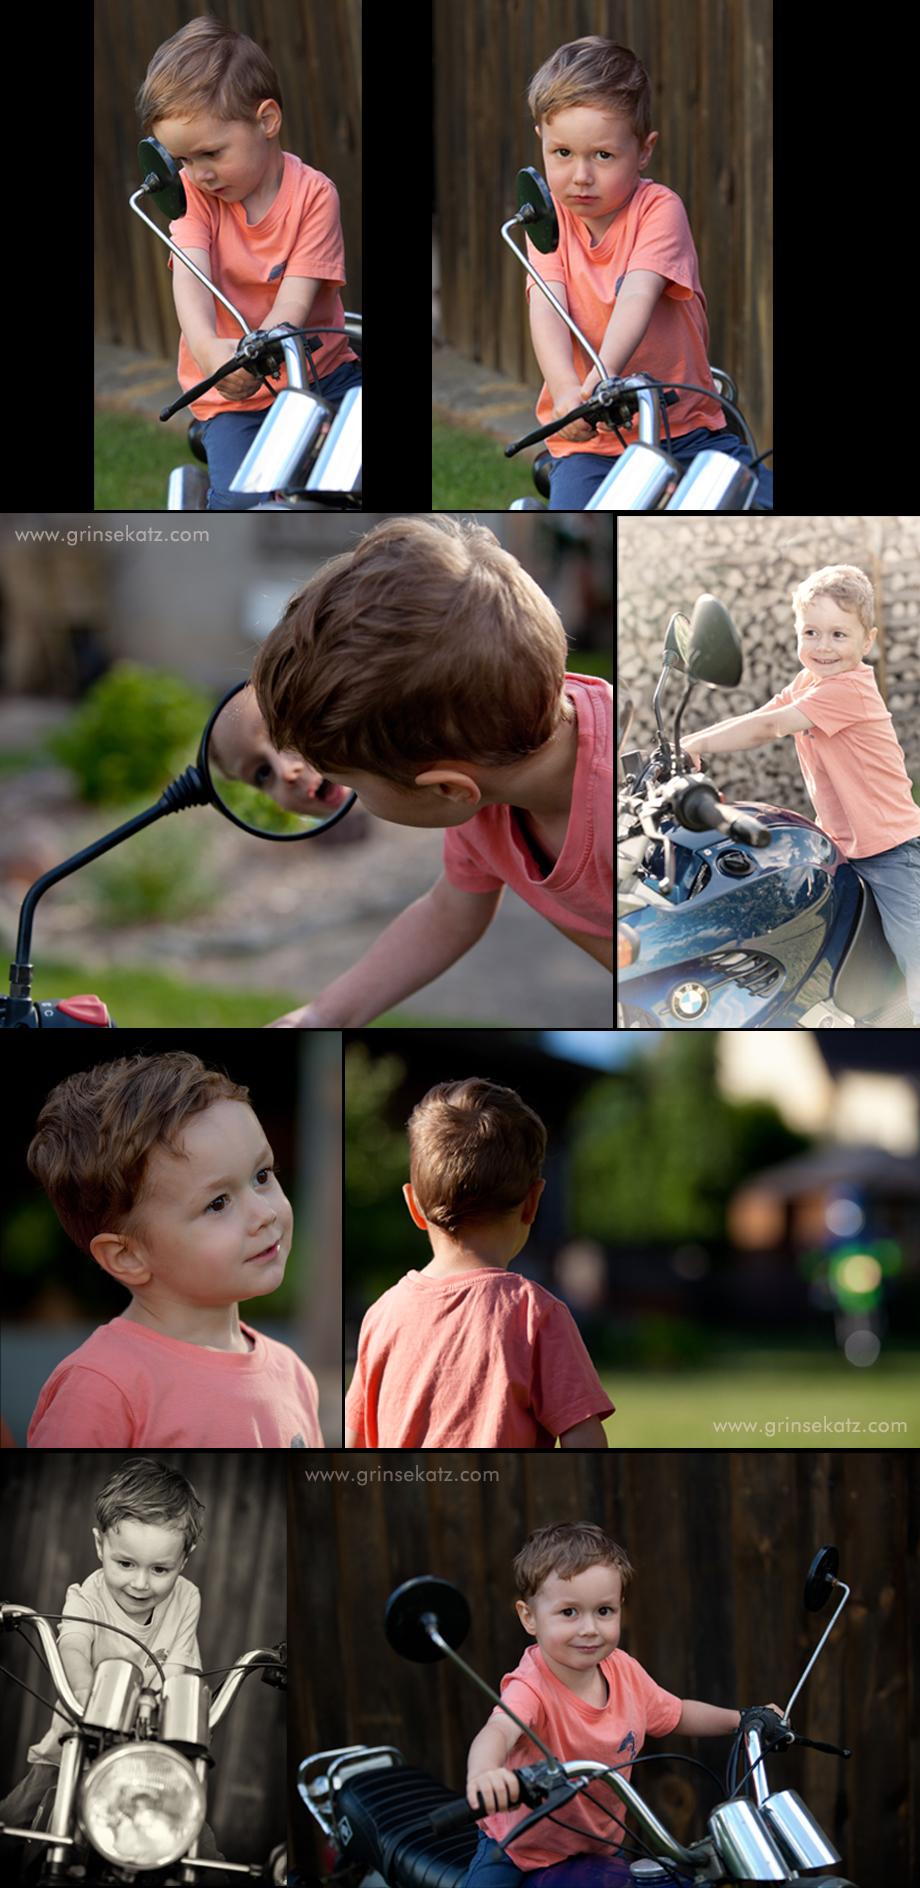 kinderfotograf-kinderfotos-uckermark-templin-prenzlau-grinsekatz